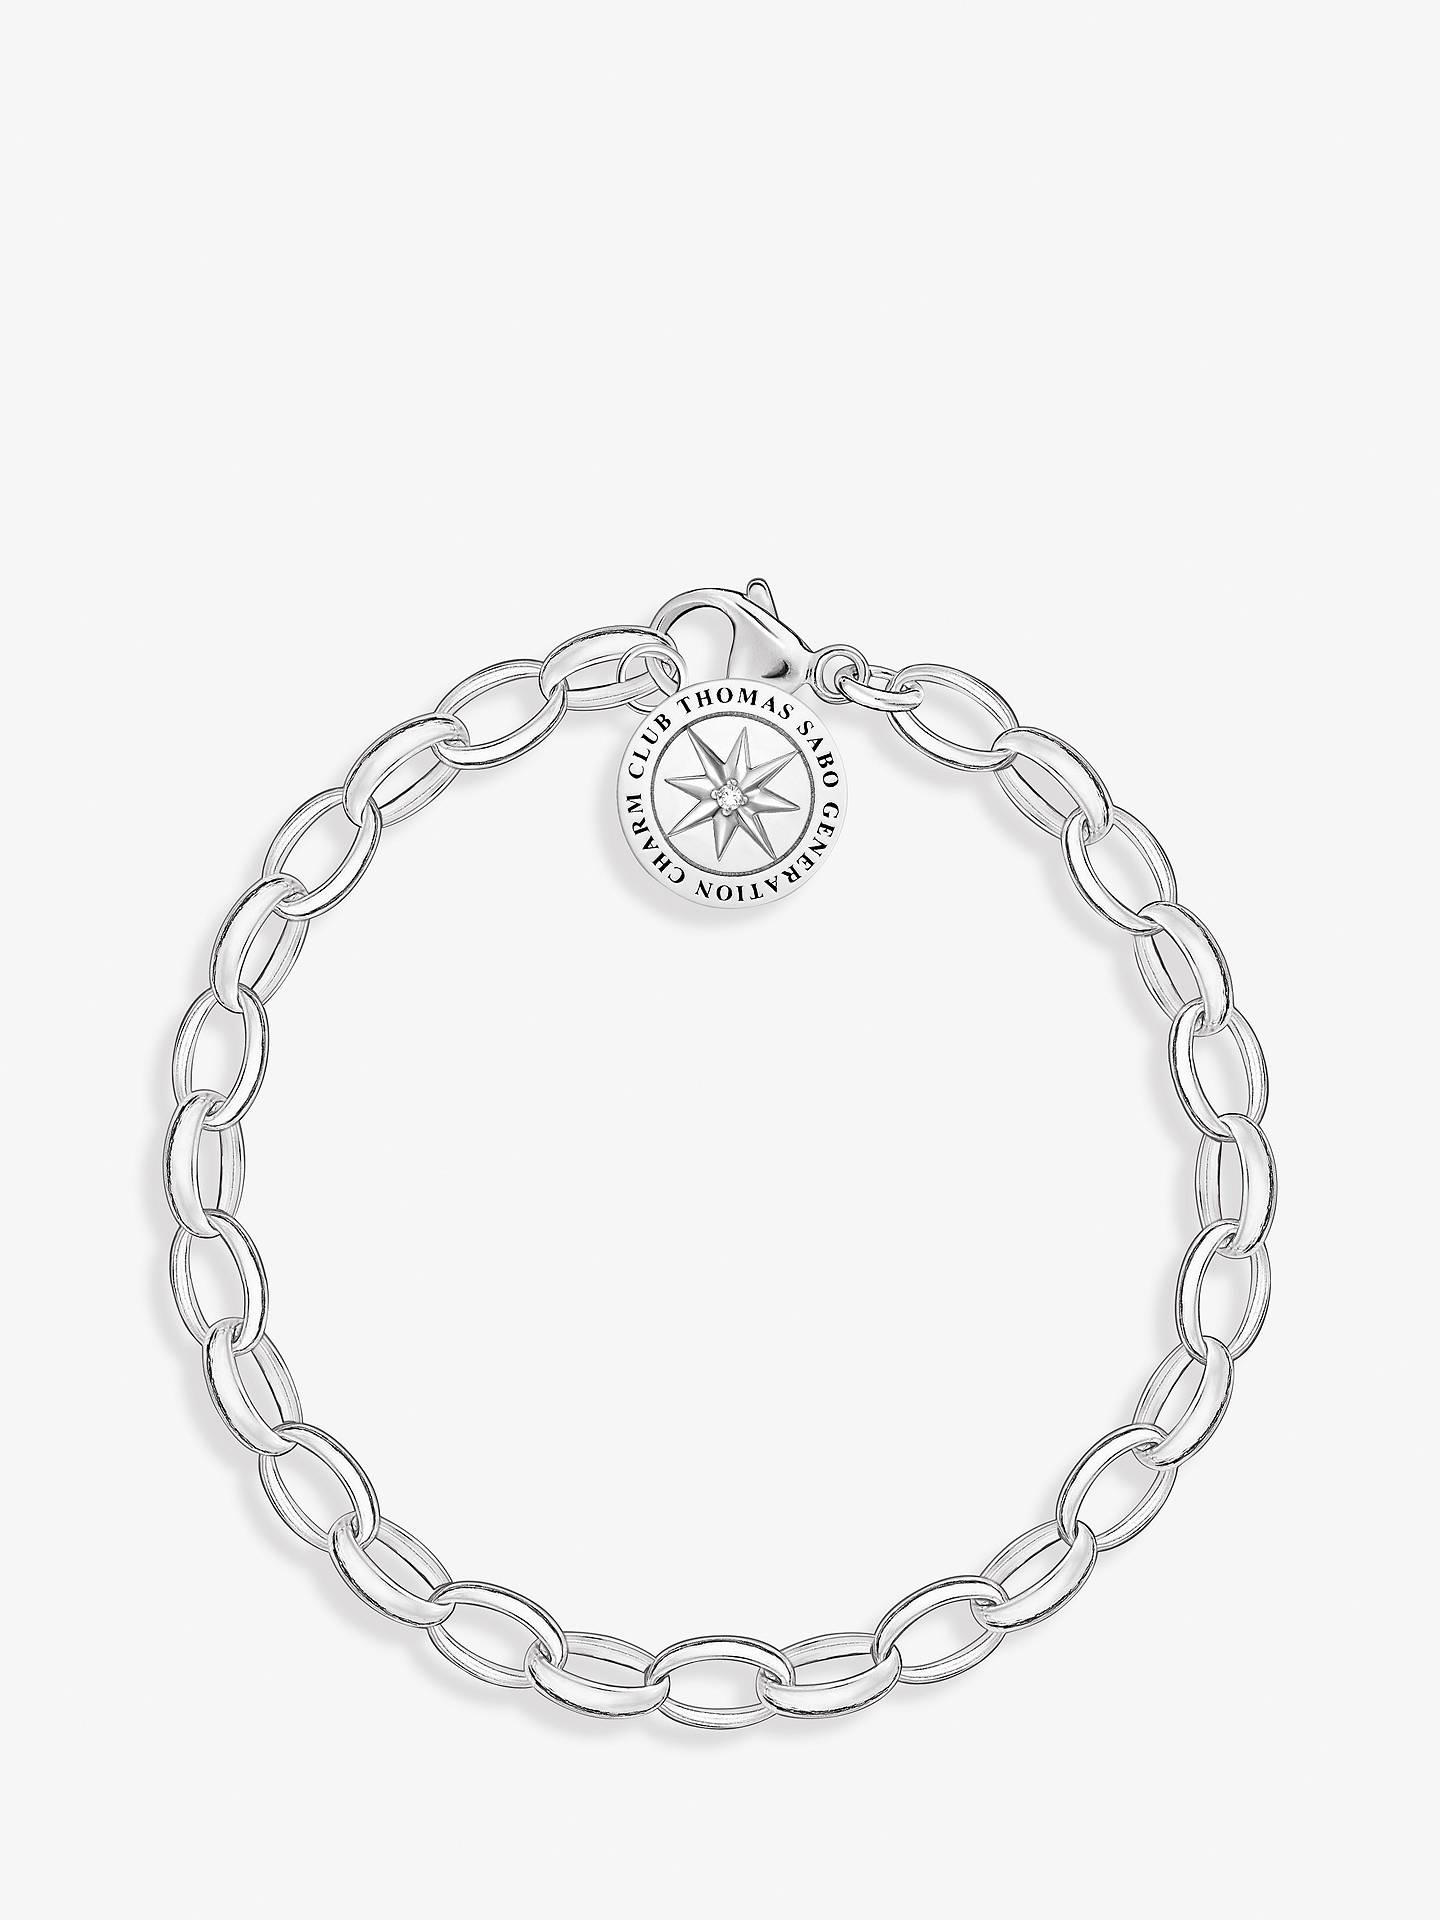 7bc853815ac Buy THOMAS SABO Charm Club Heart Angel Charm Chain Bracelet, Silver Online  at johnlewis.